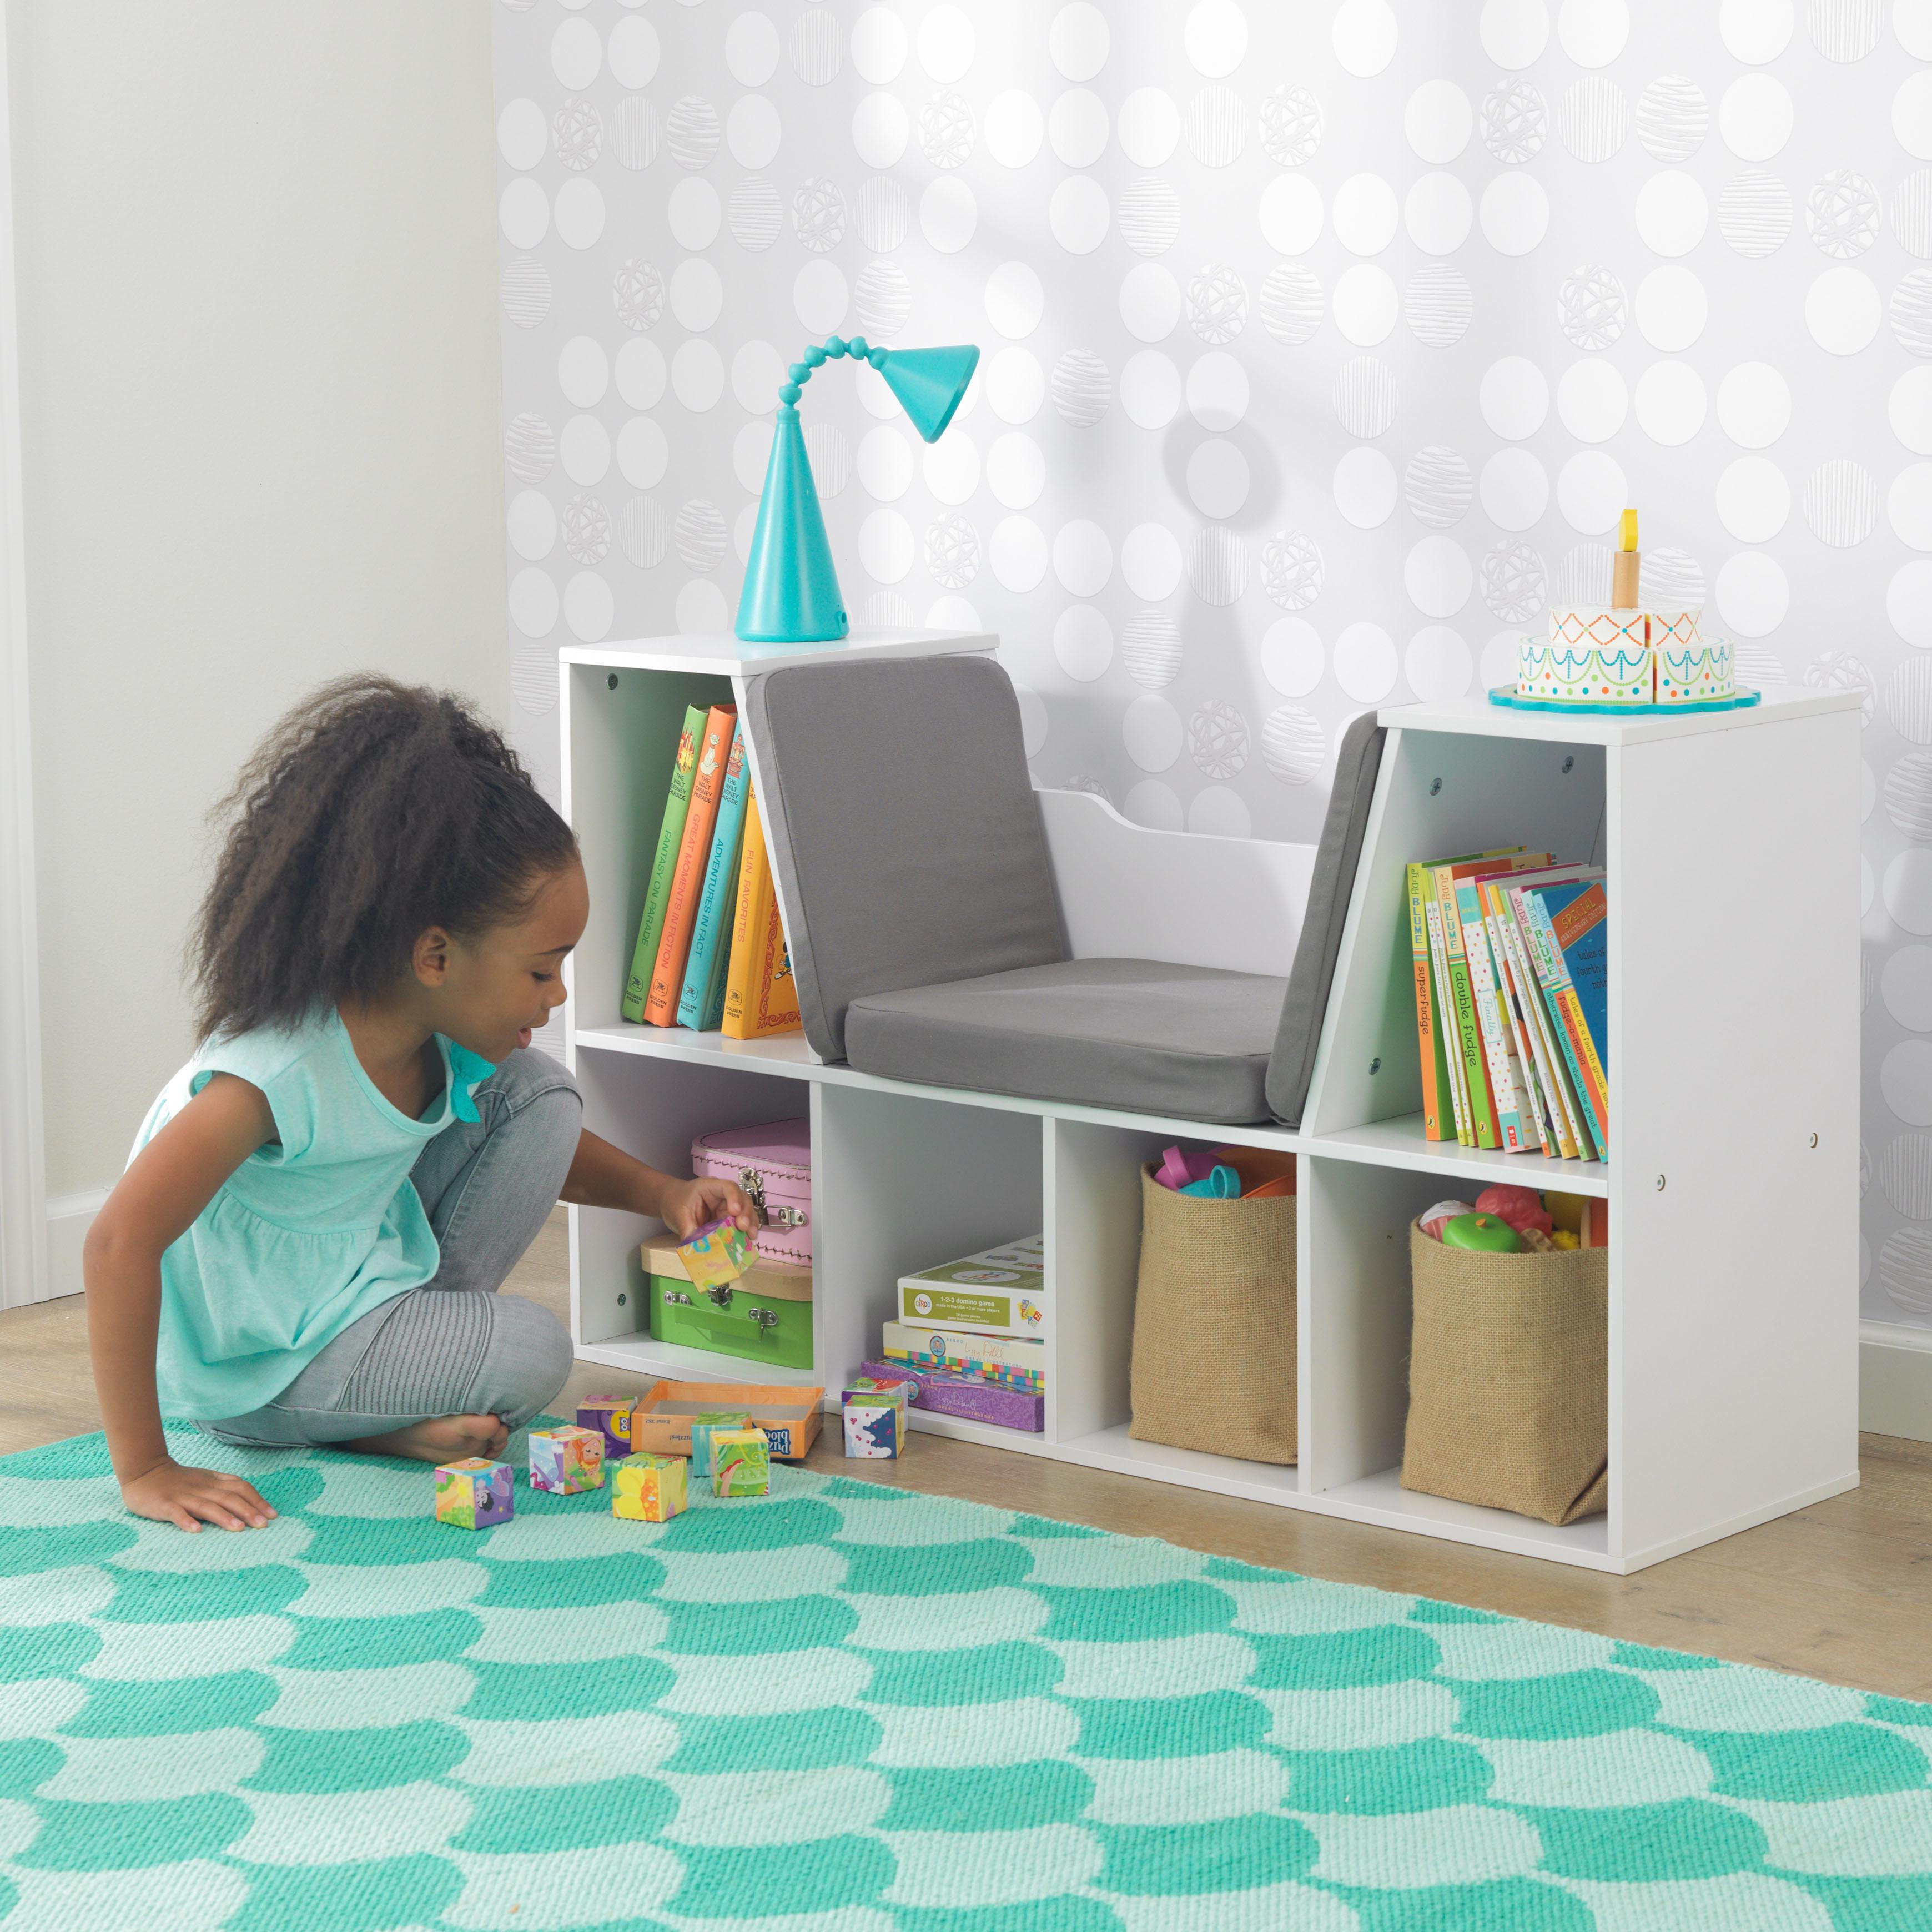 KidKraft Bookshelf from Walmart